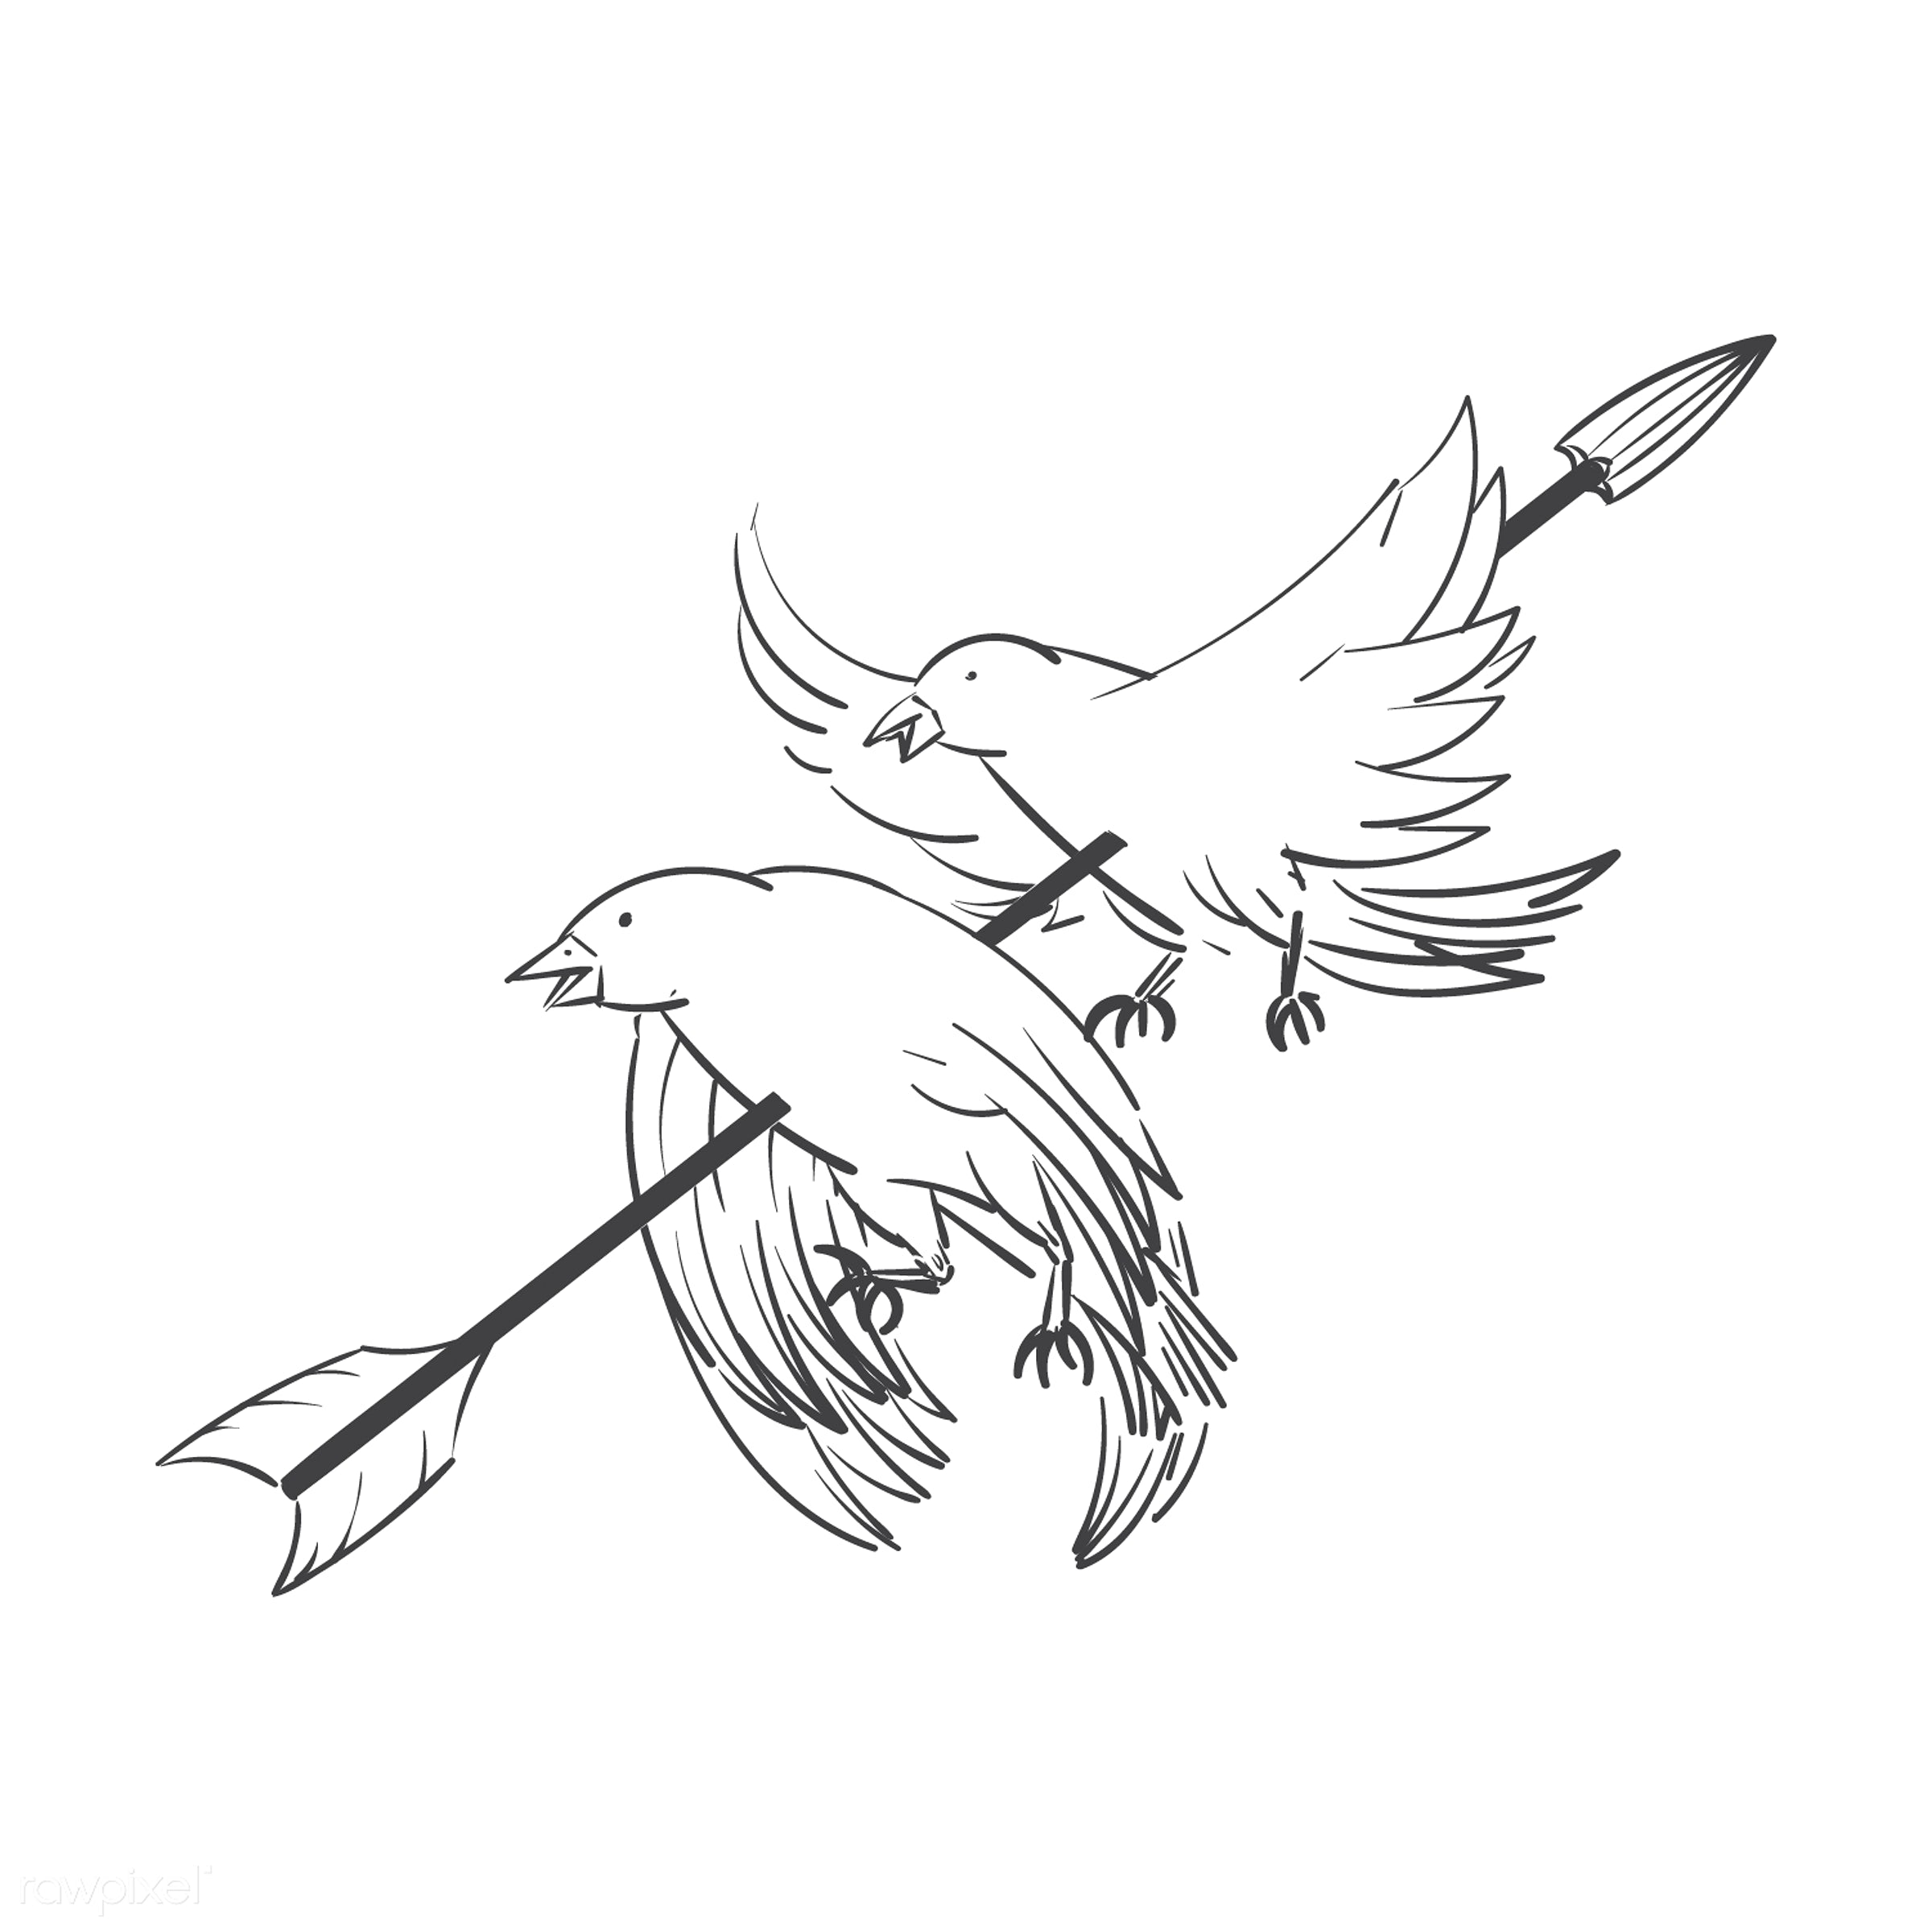 Kill two birds with one stone idiom vector - achievement, affective, arrow, art, benefits, birds, creative, creativity,...